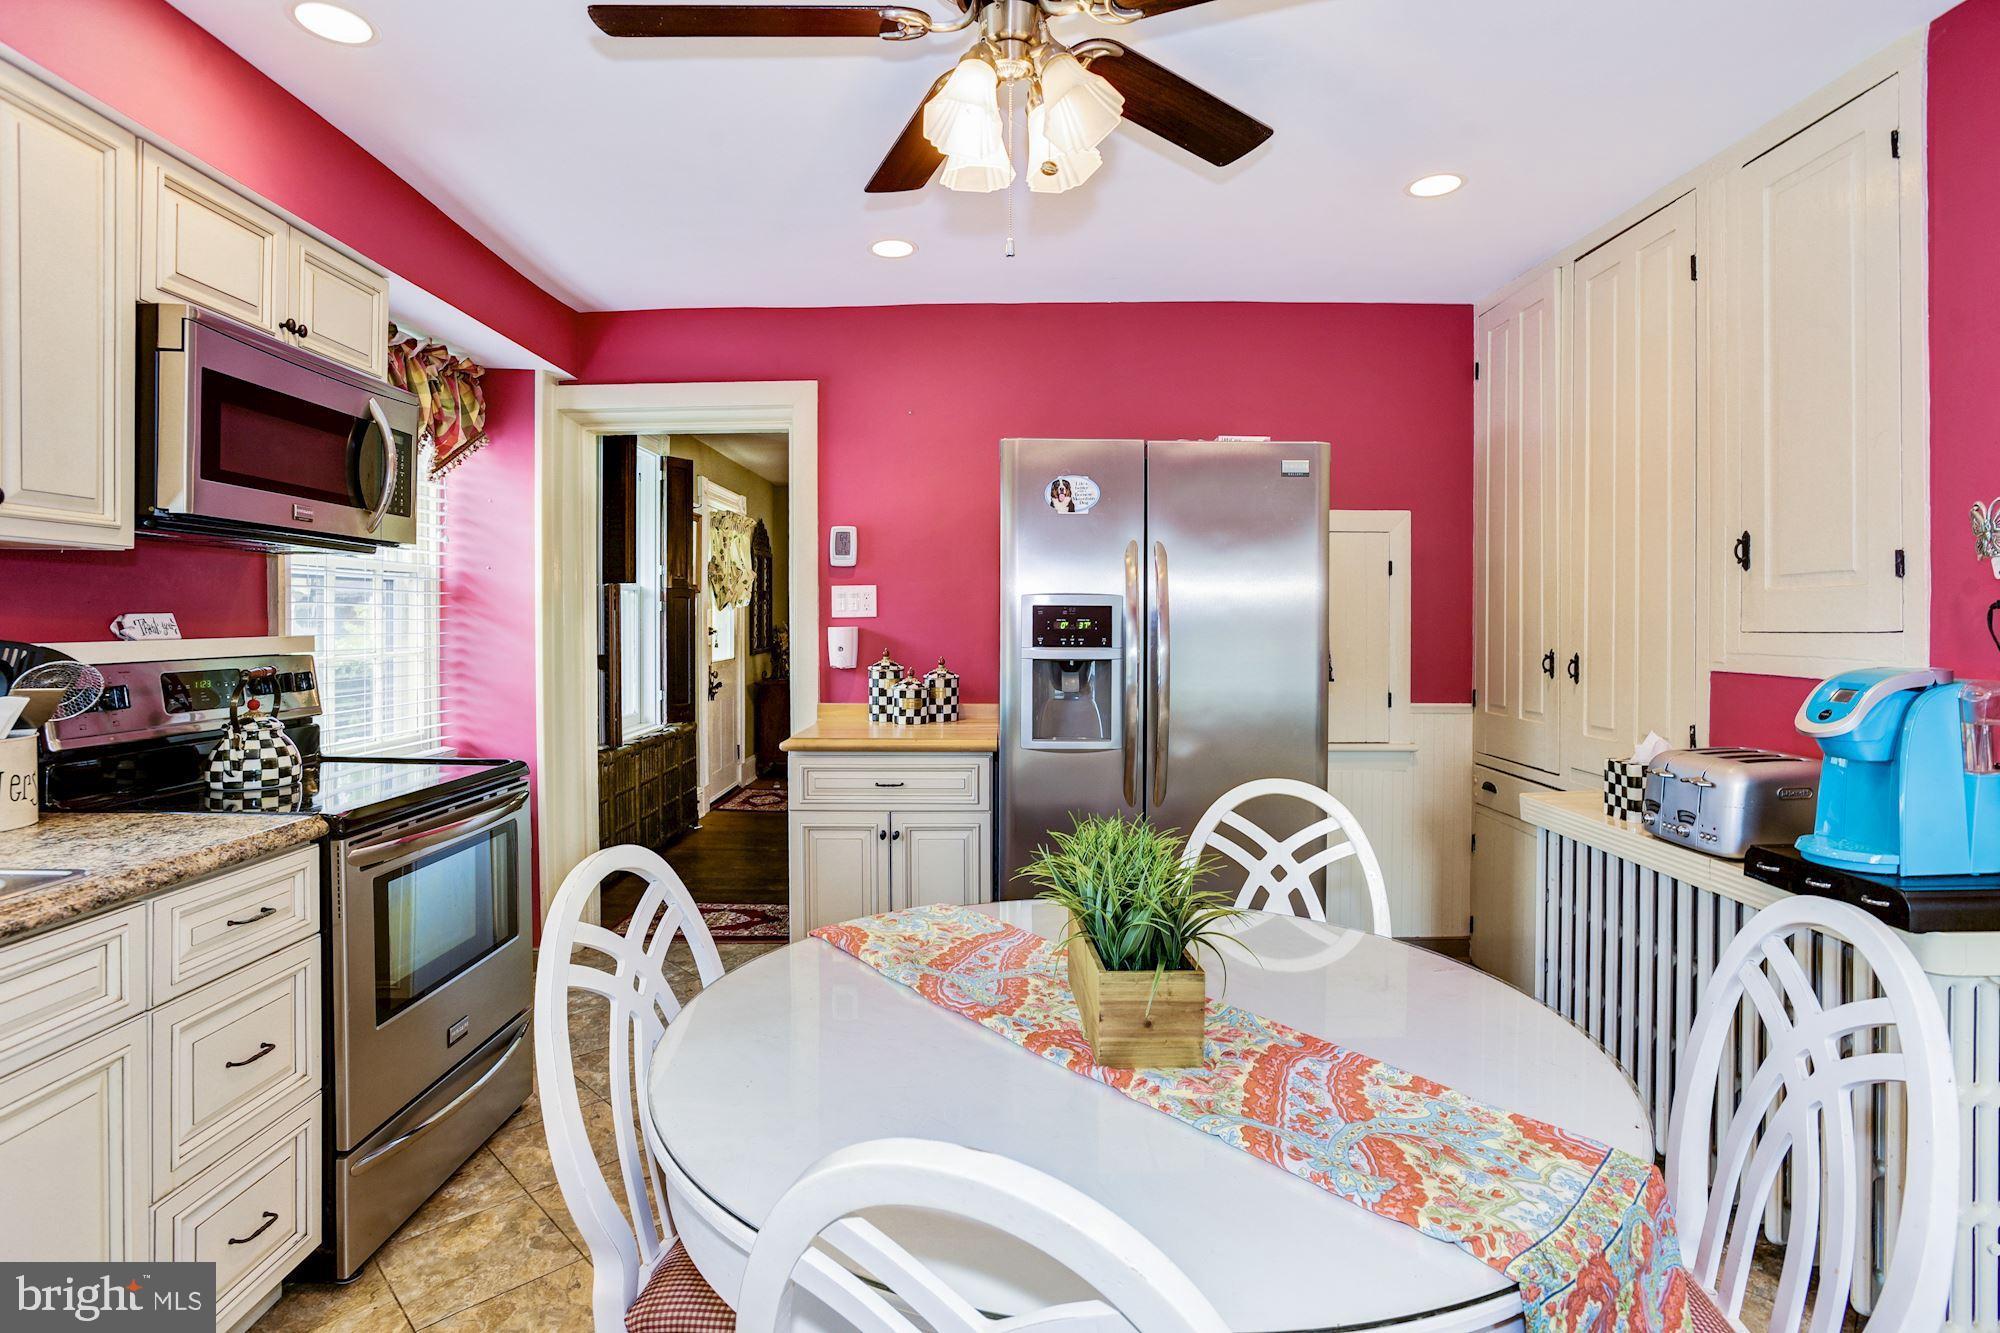 Original cabinetry has pass thru to Dining Rm